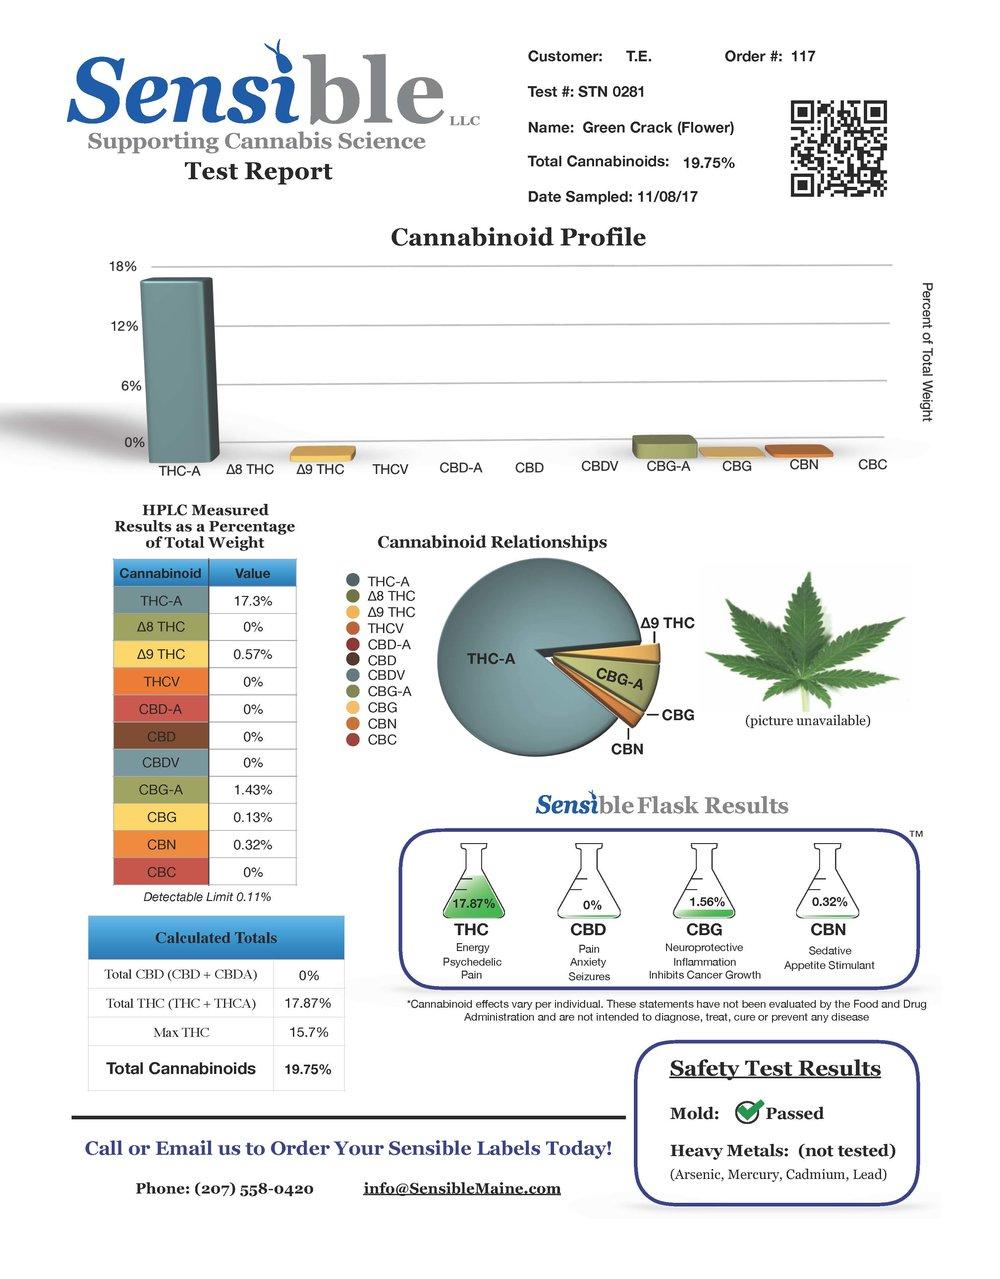 Test Report stn0281.jpg